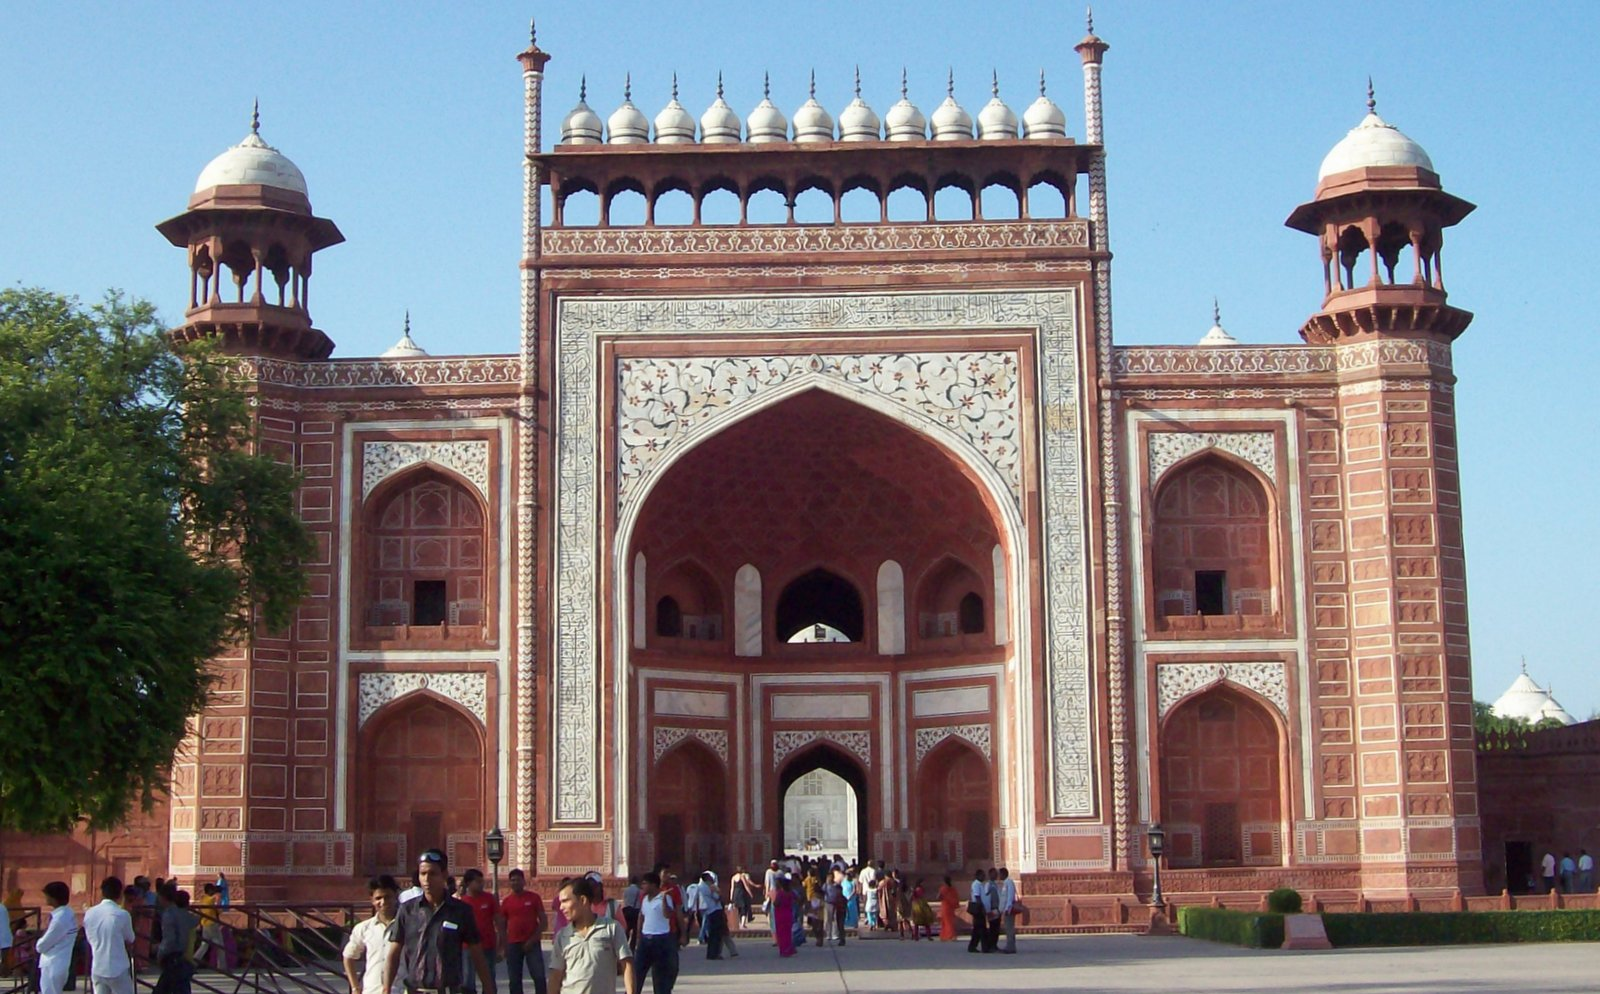 Großes Tor - Taj Mahal